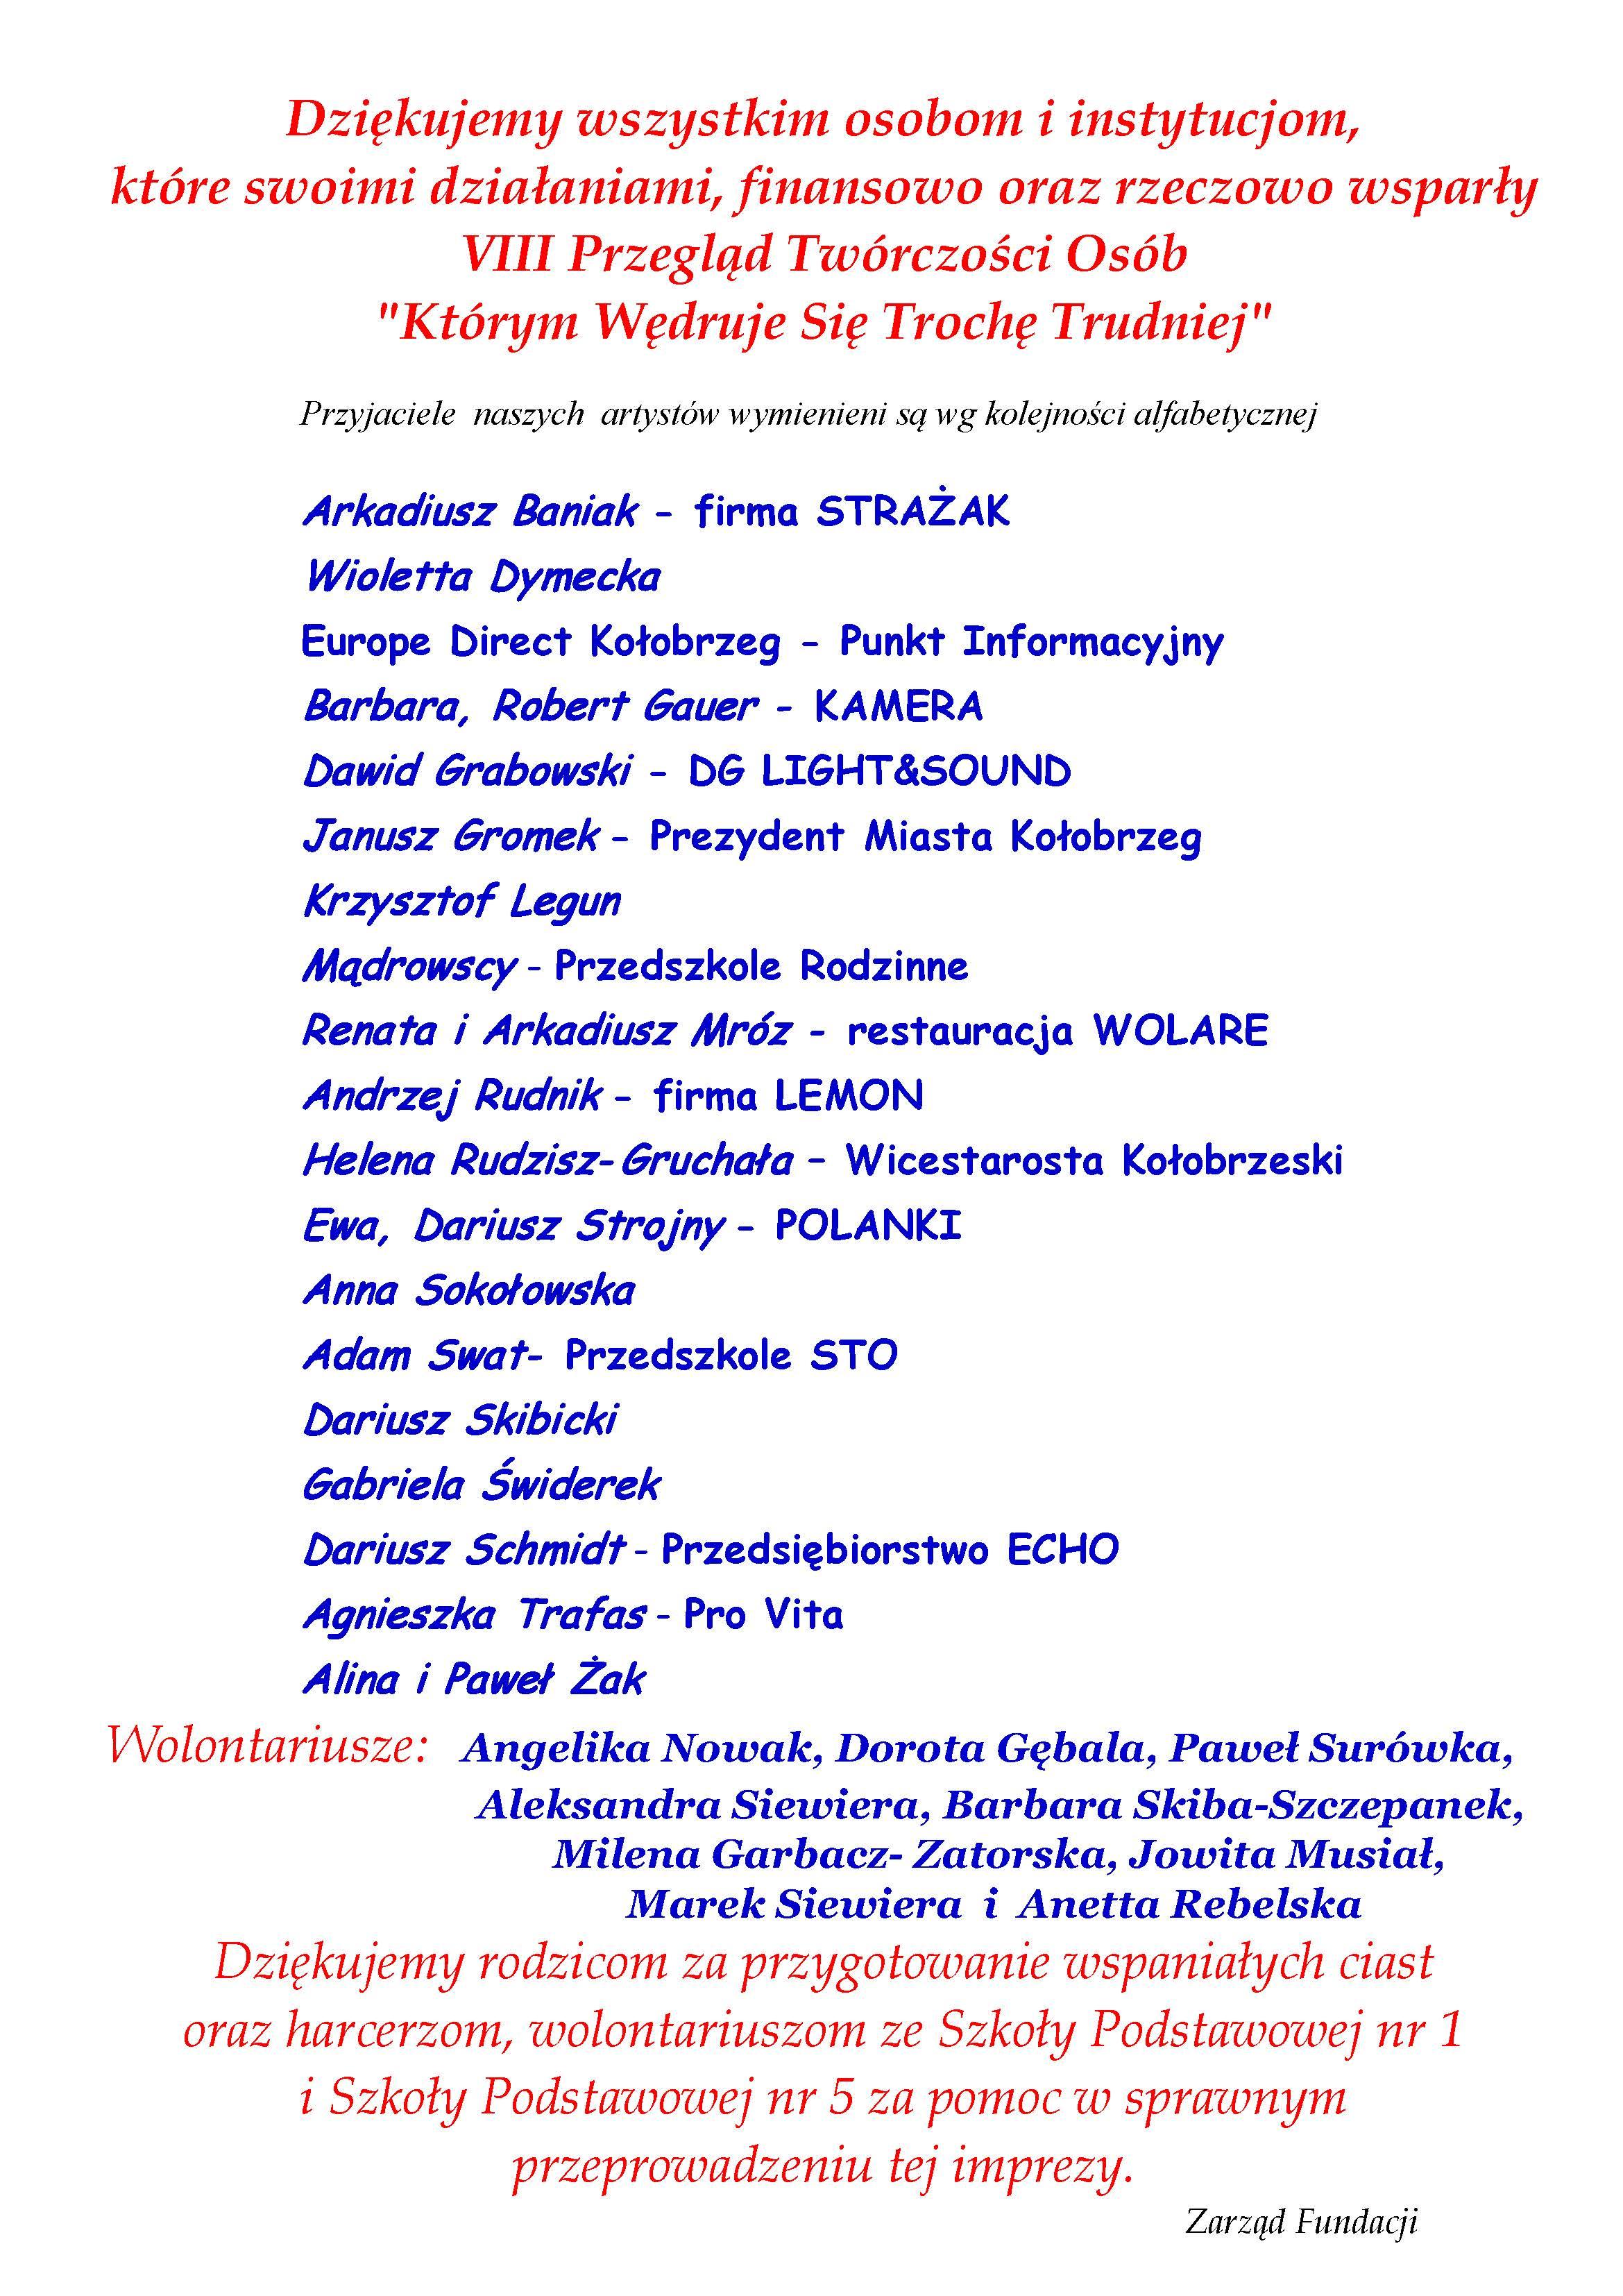 lista-sponsorow-viii-przegladu